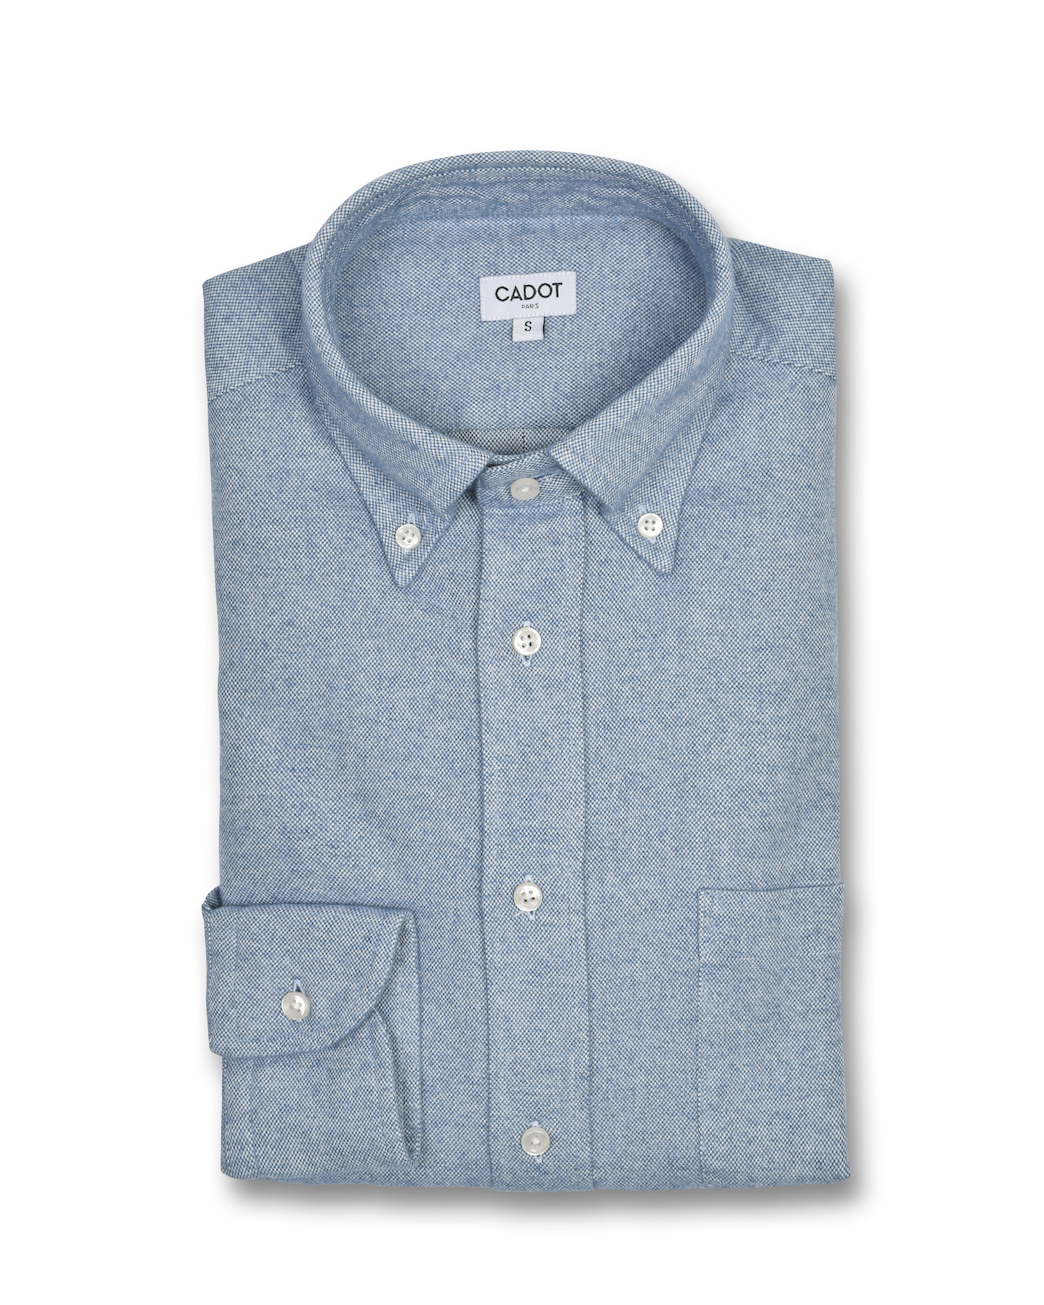 Chemise Gianni en coton Oxford – bleu ciel | Cadot